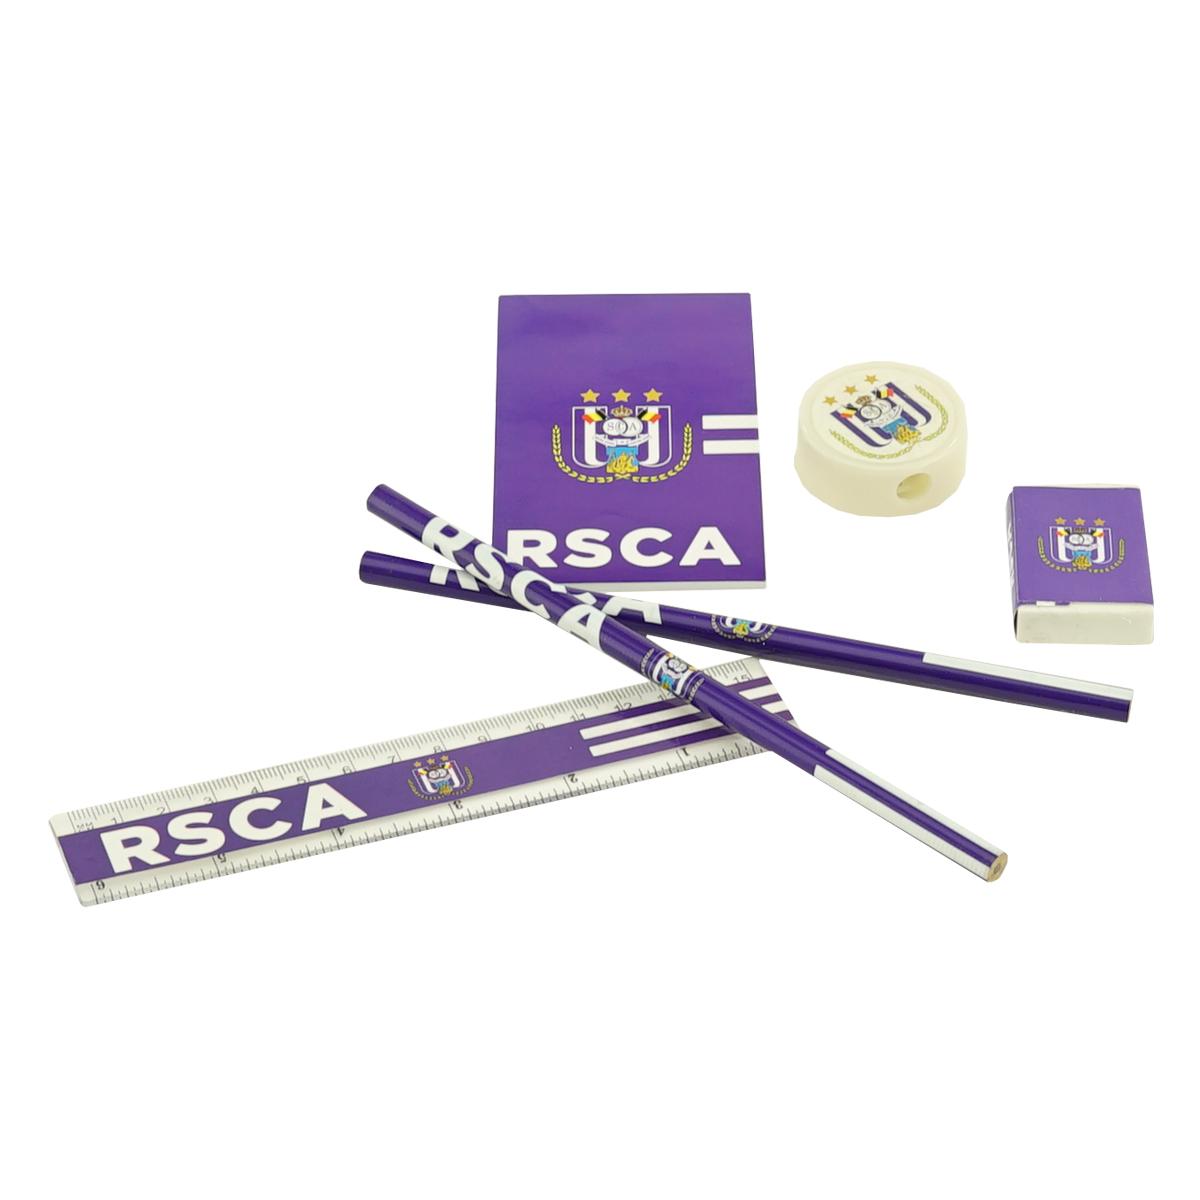 RSCA Back To School Kit